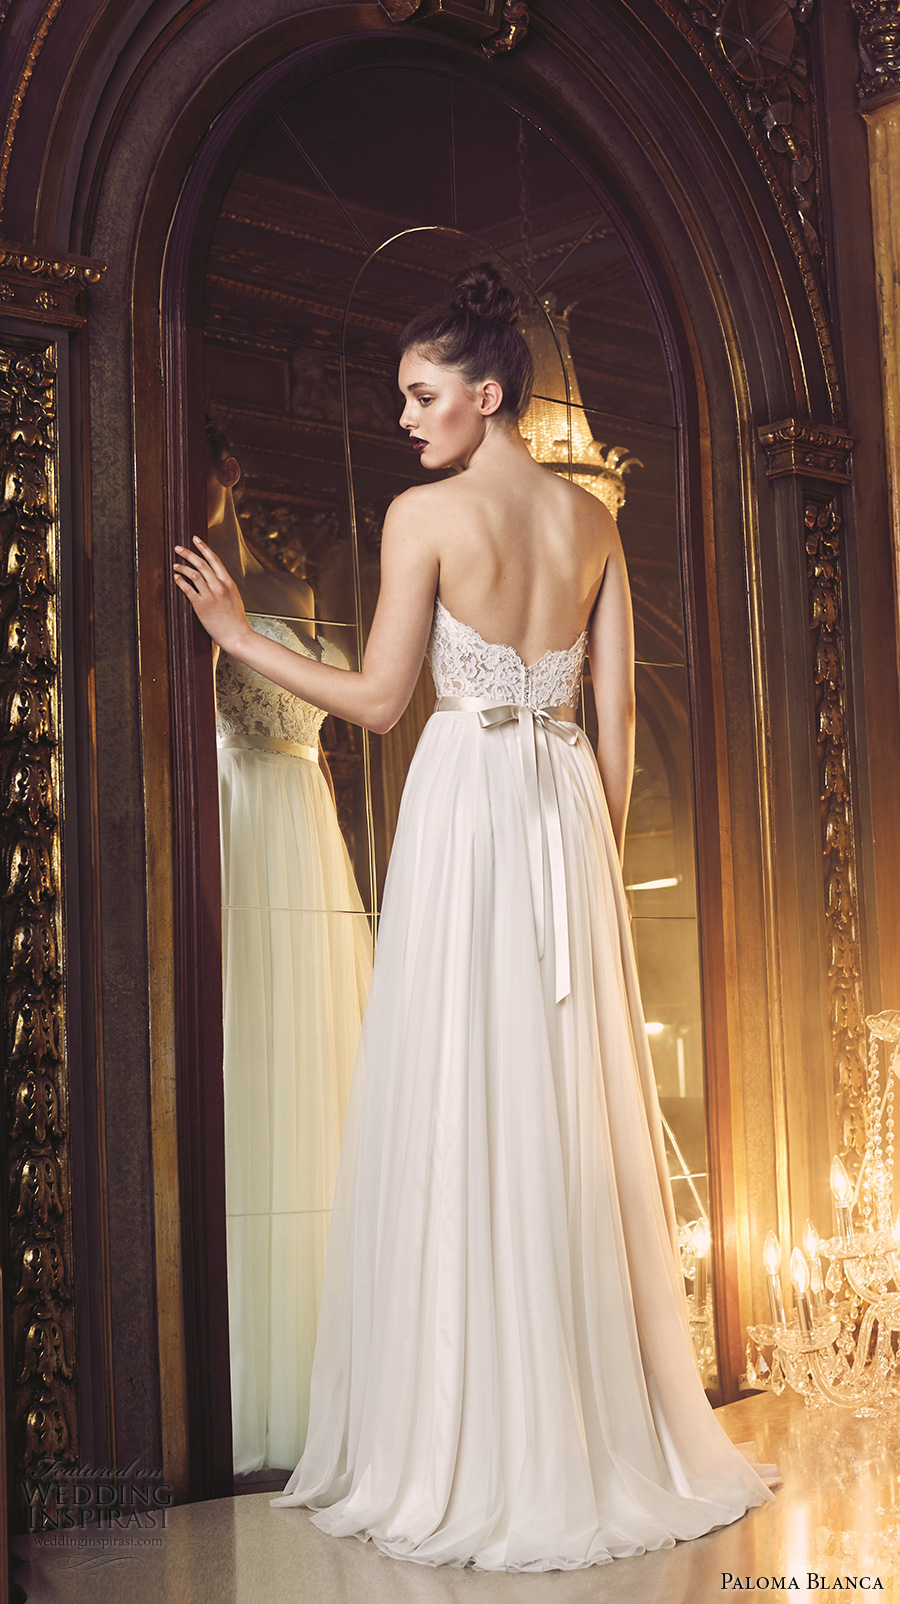 Paloma Blanca Wedding Dresses For Sale 48 Cool paloma blanca fall bridal